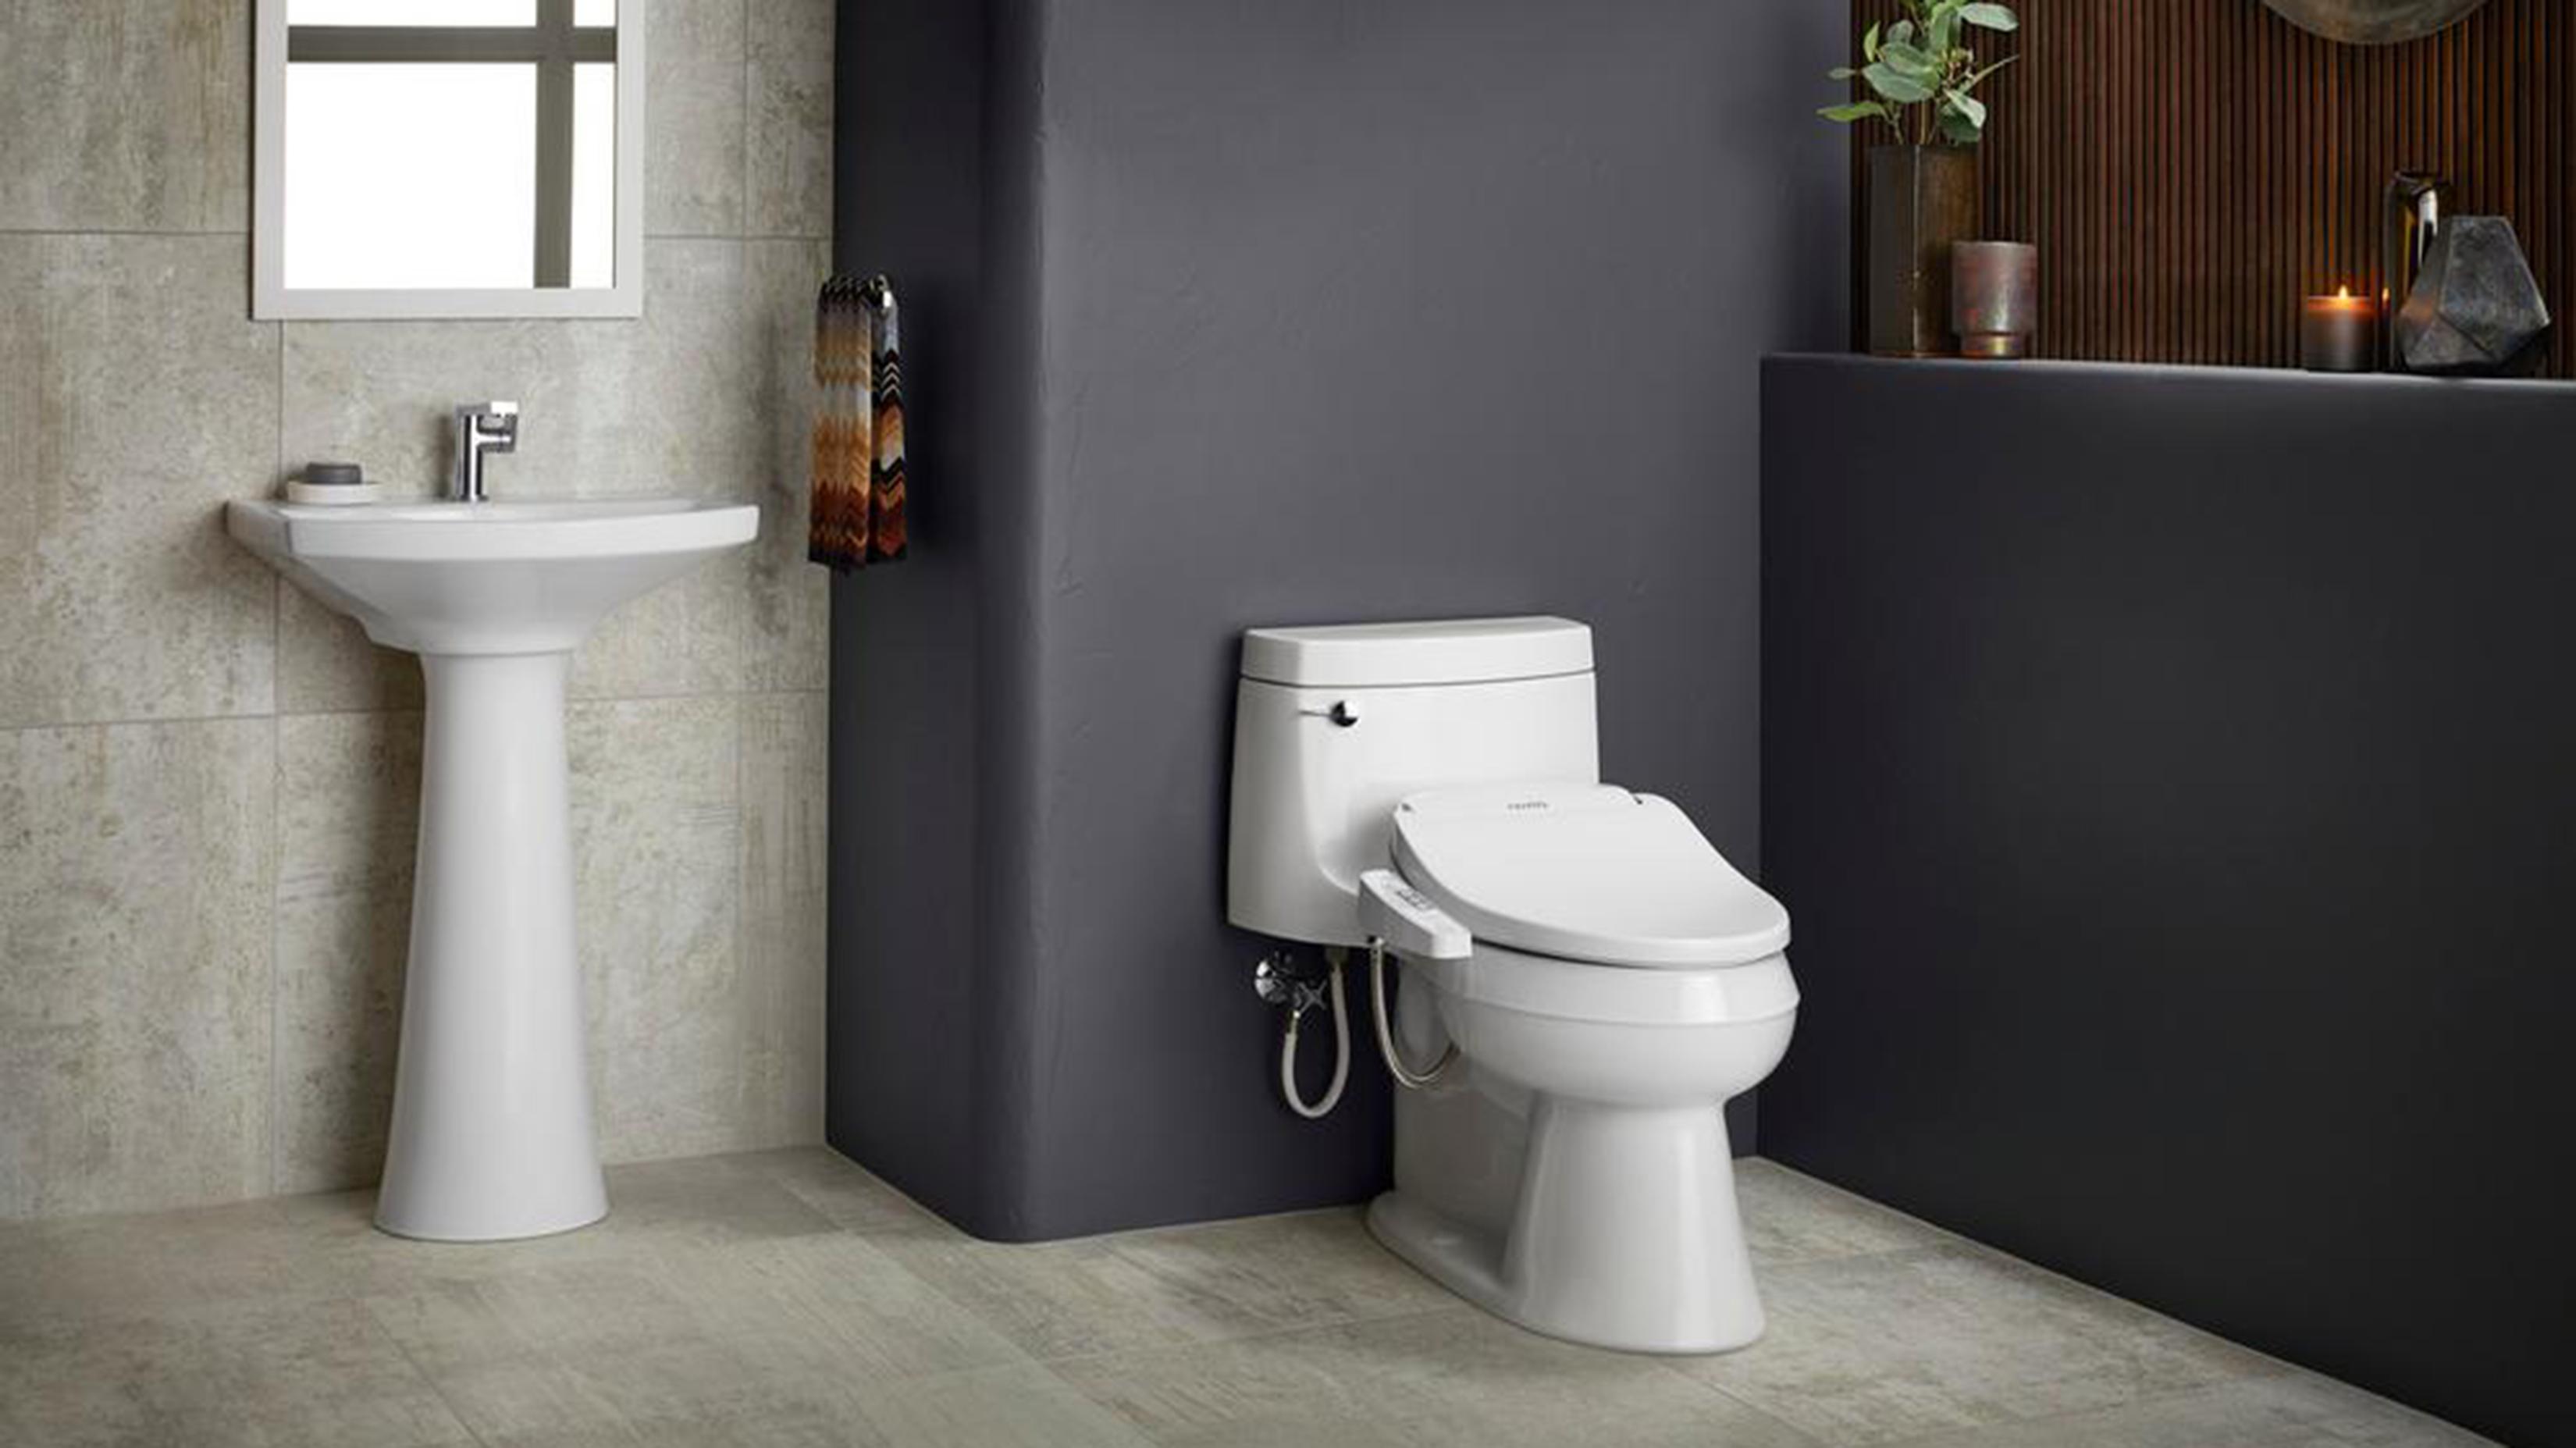 Best Bidet Your Guide To Picking The Right Bidet Toilet Attachment Cnn Underscored